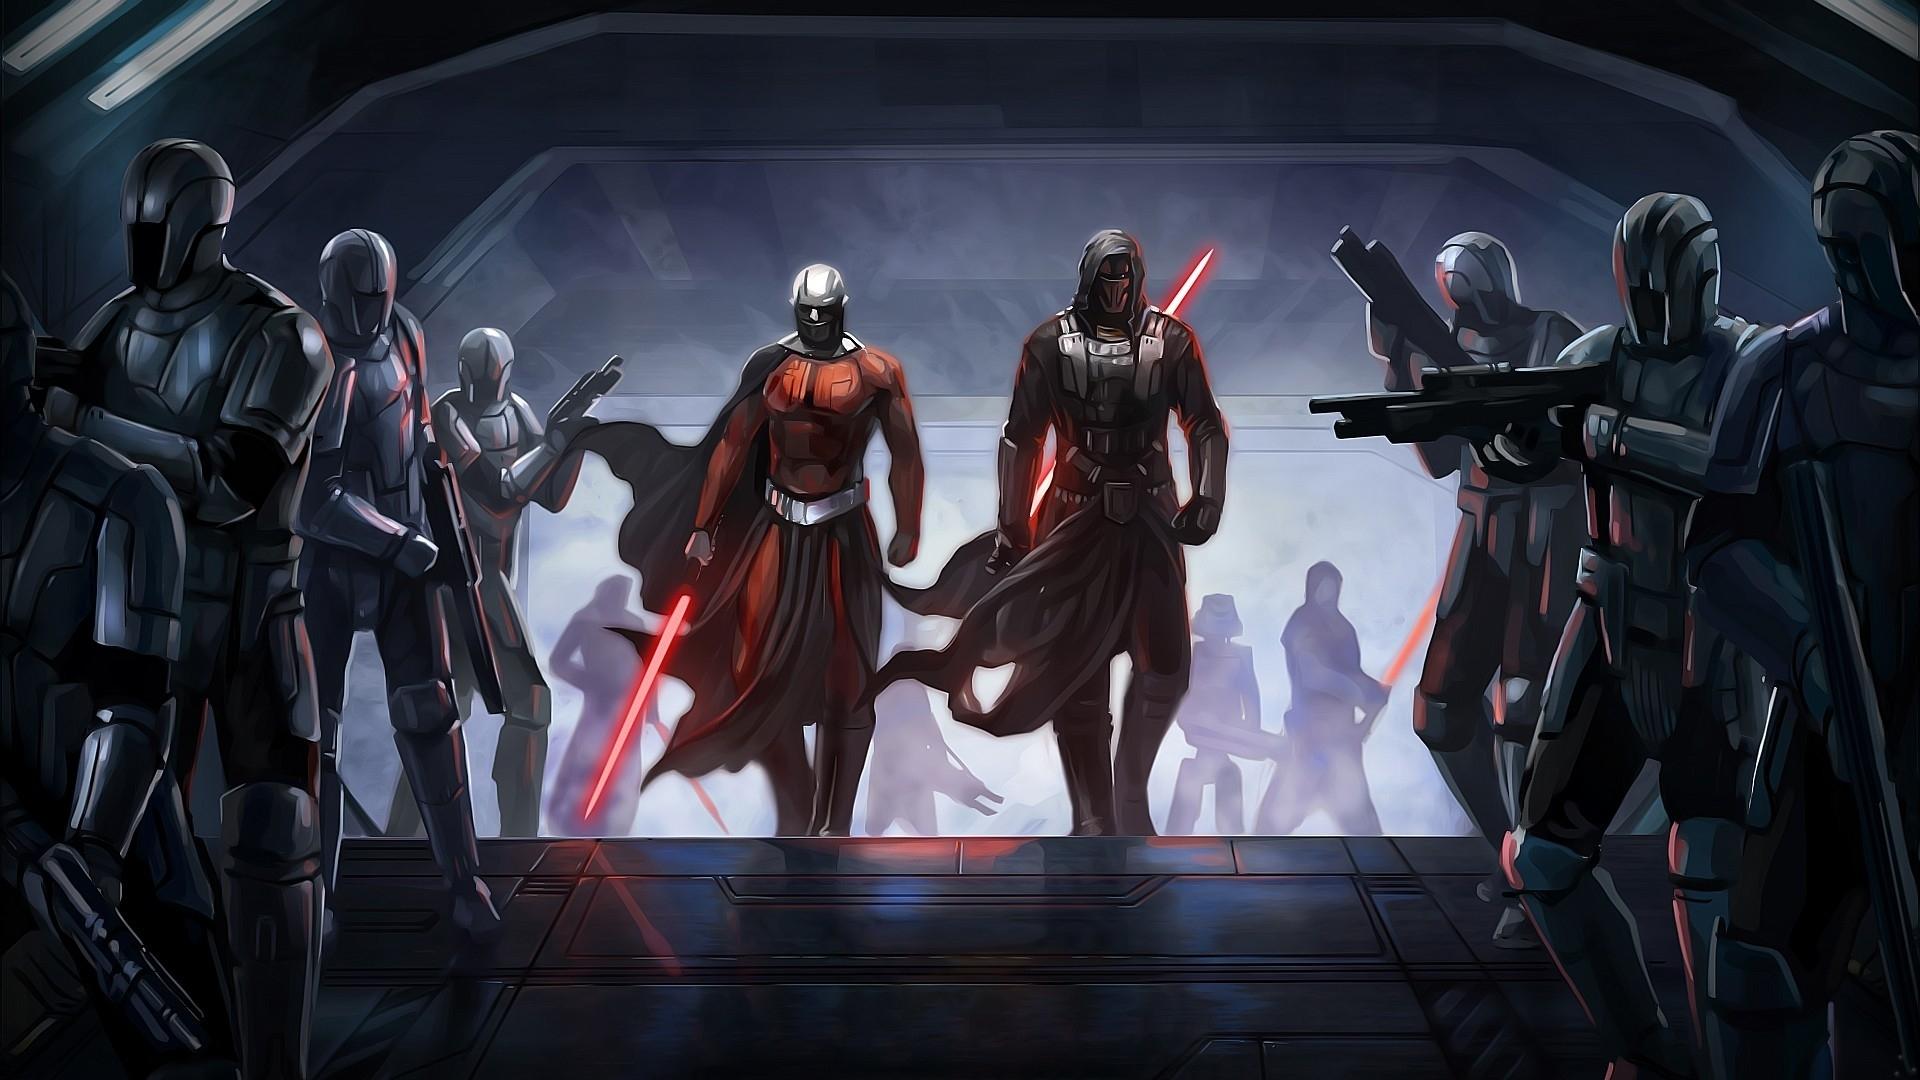 star wars revan wallpaper (74+ images)